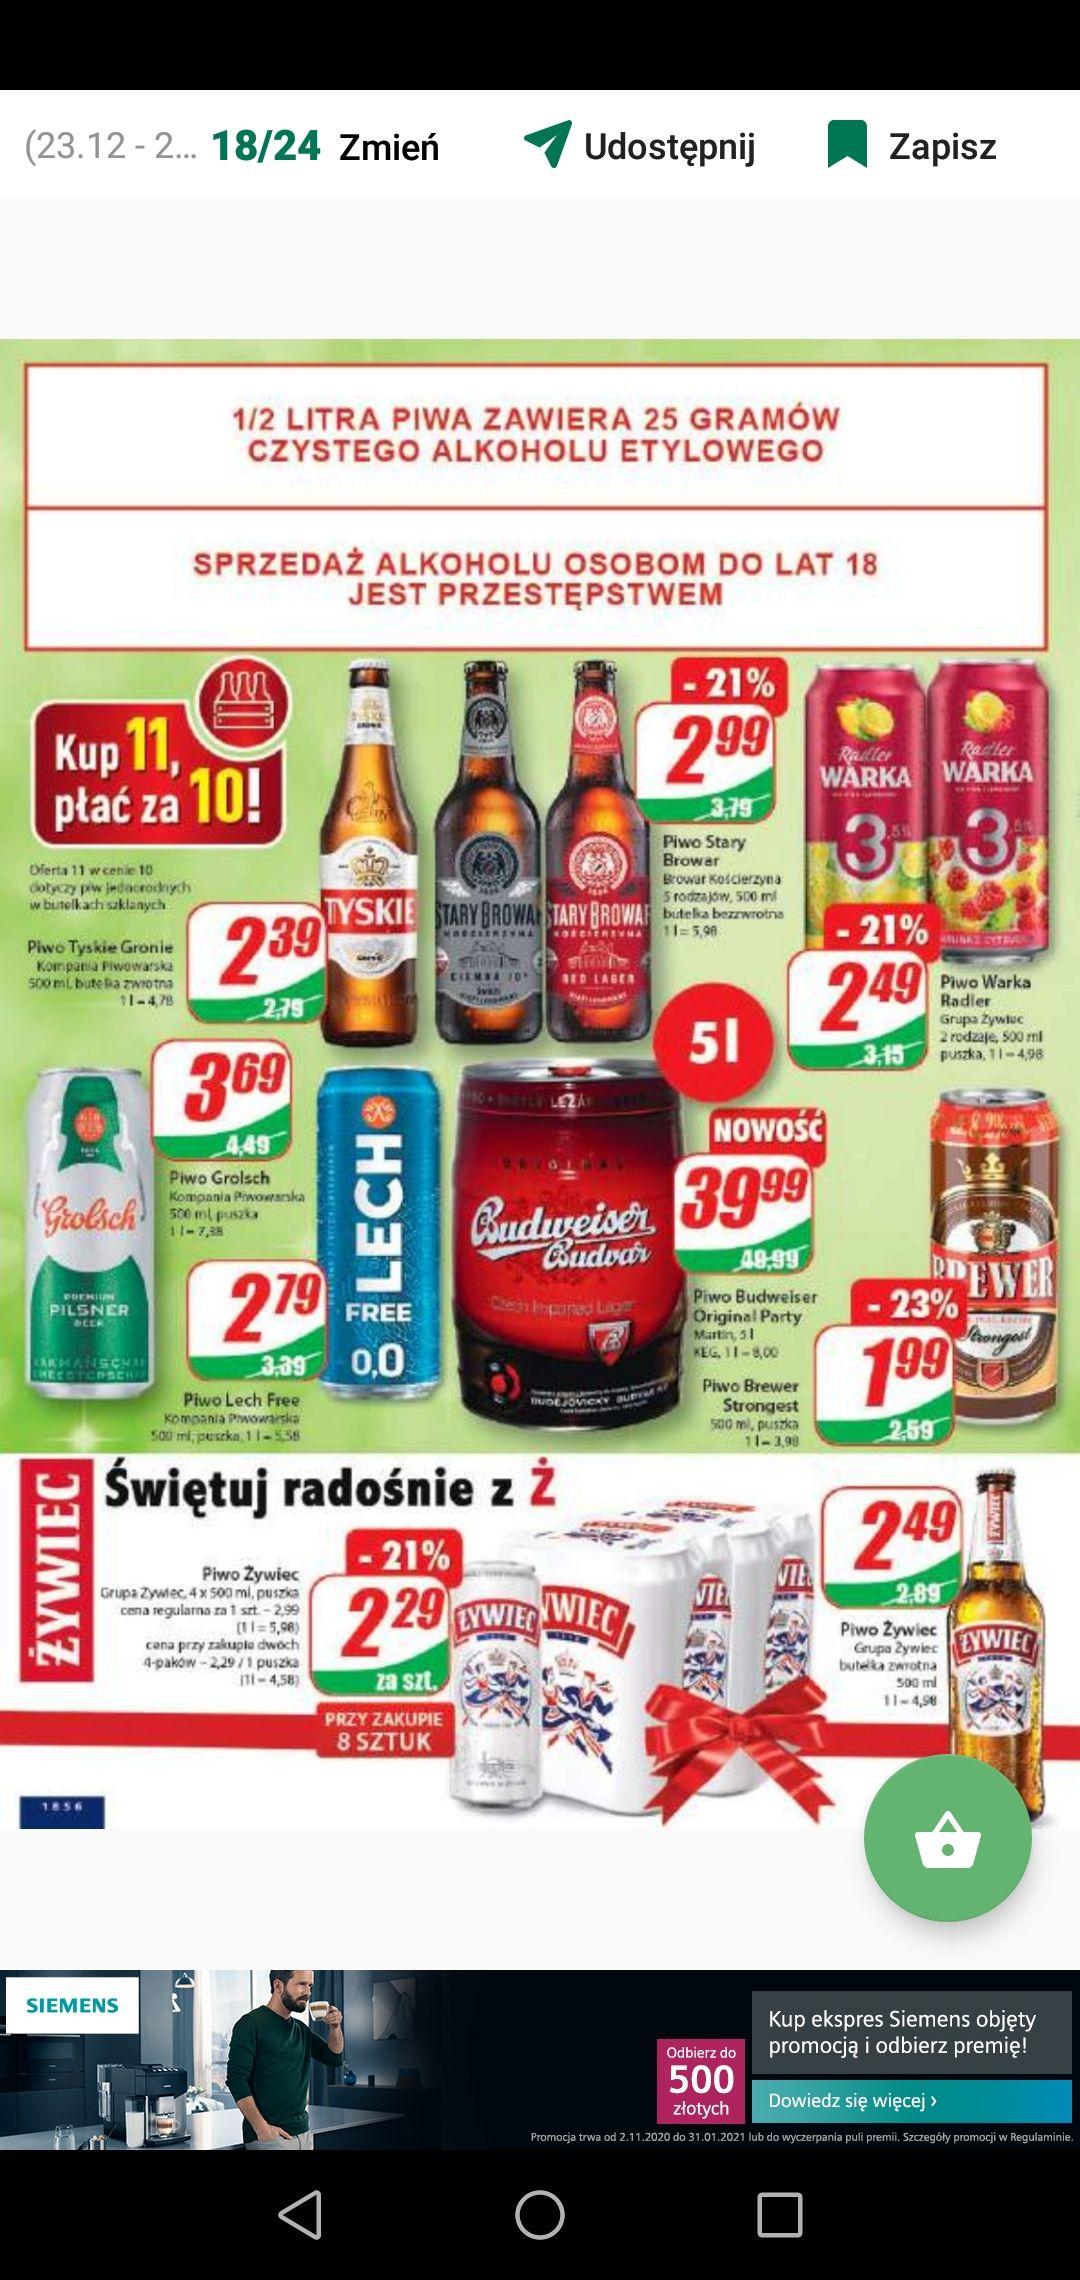 Piwo Budweiser Original (beczka) 5l w Dino